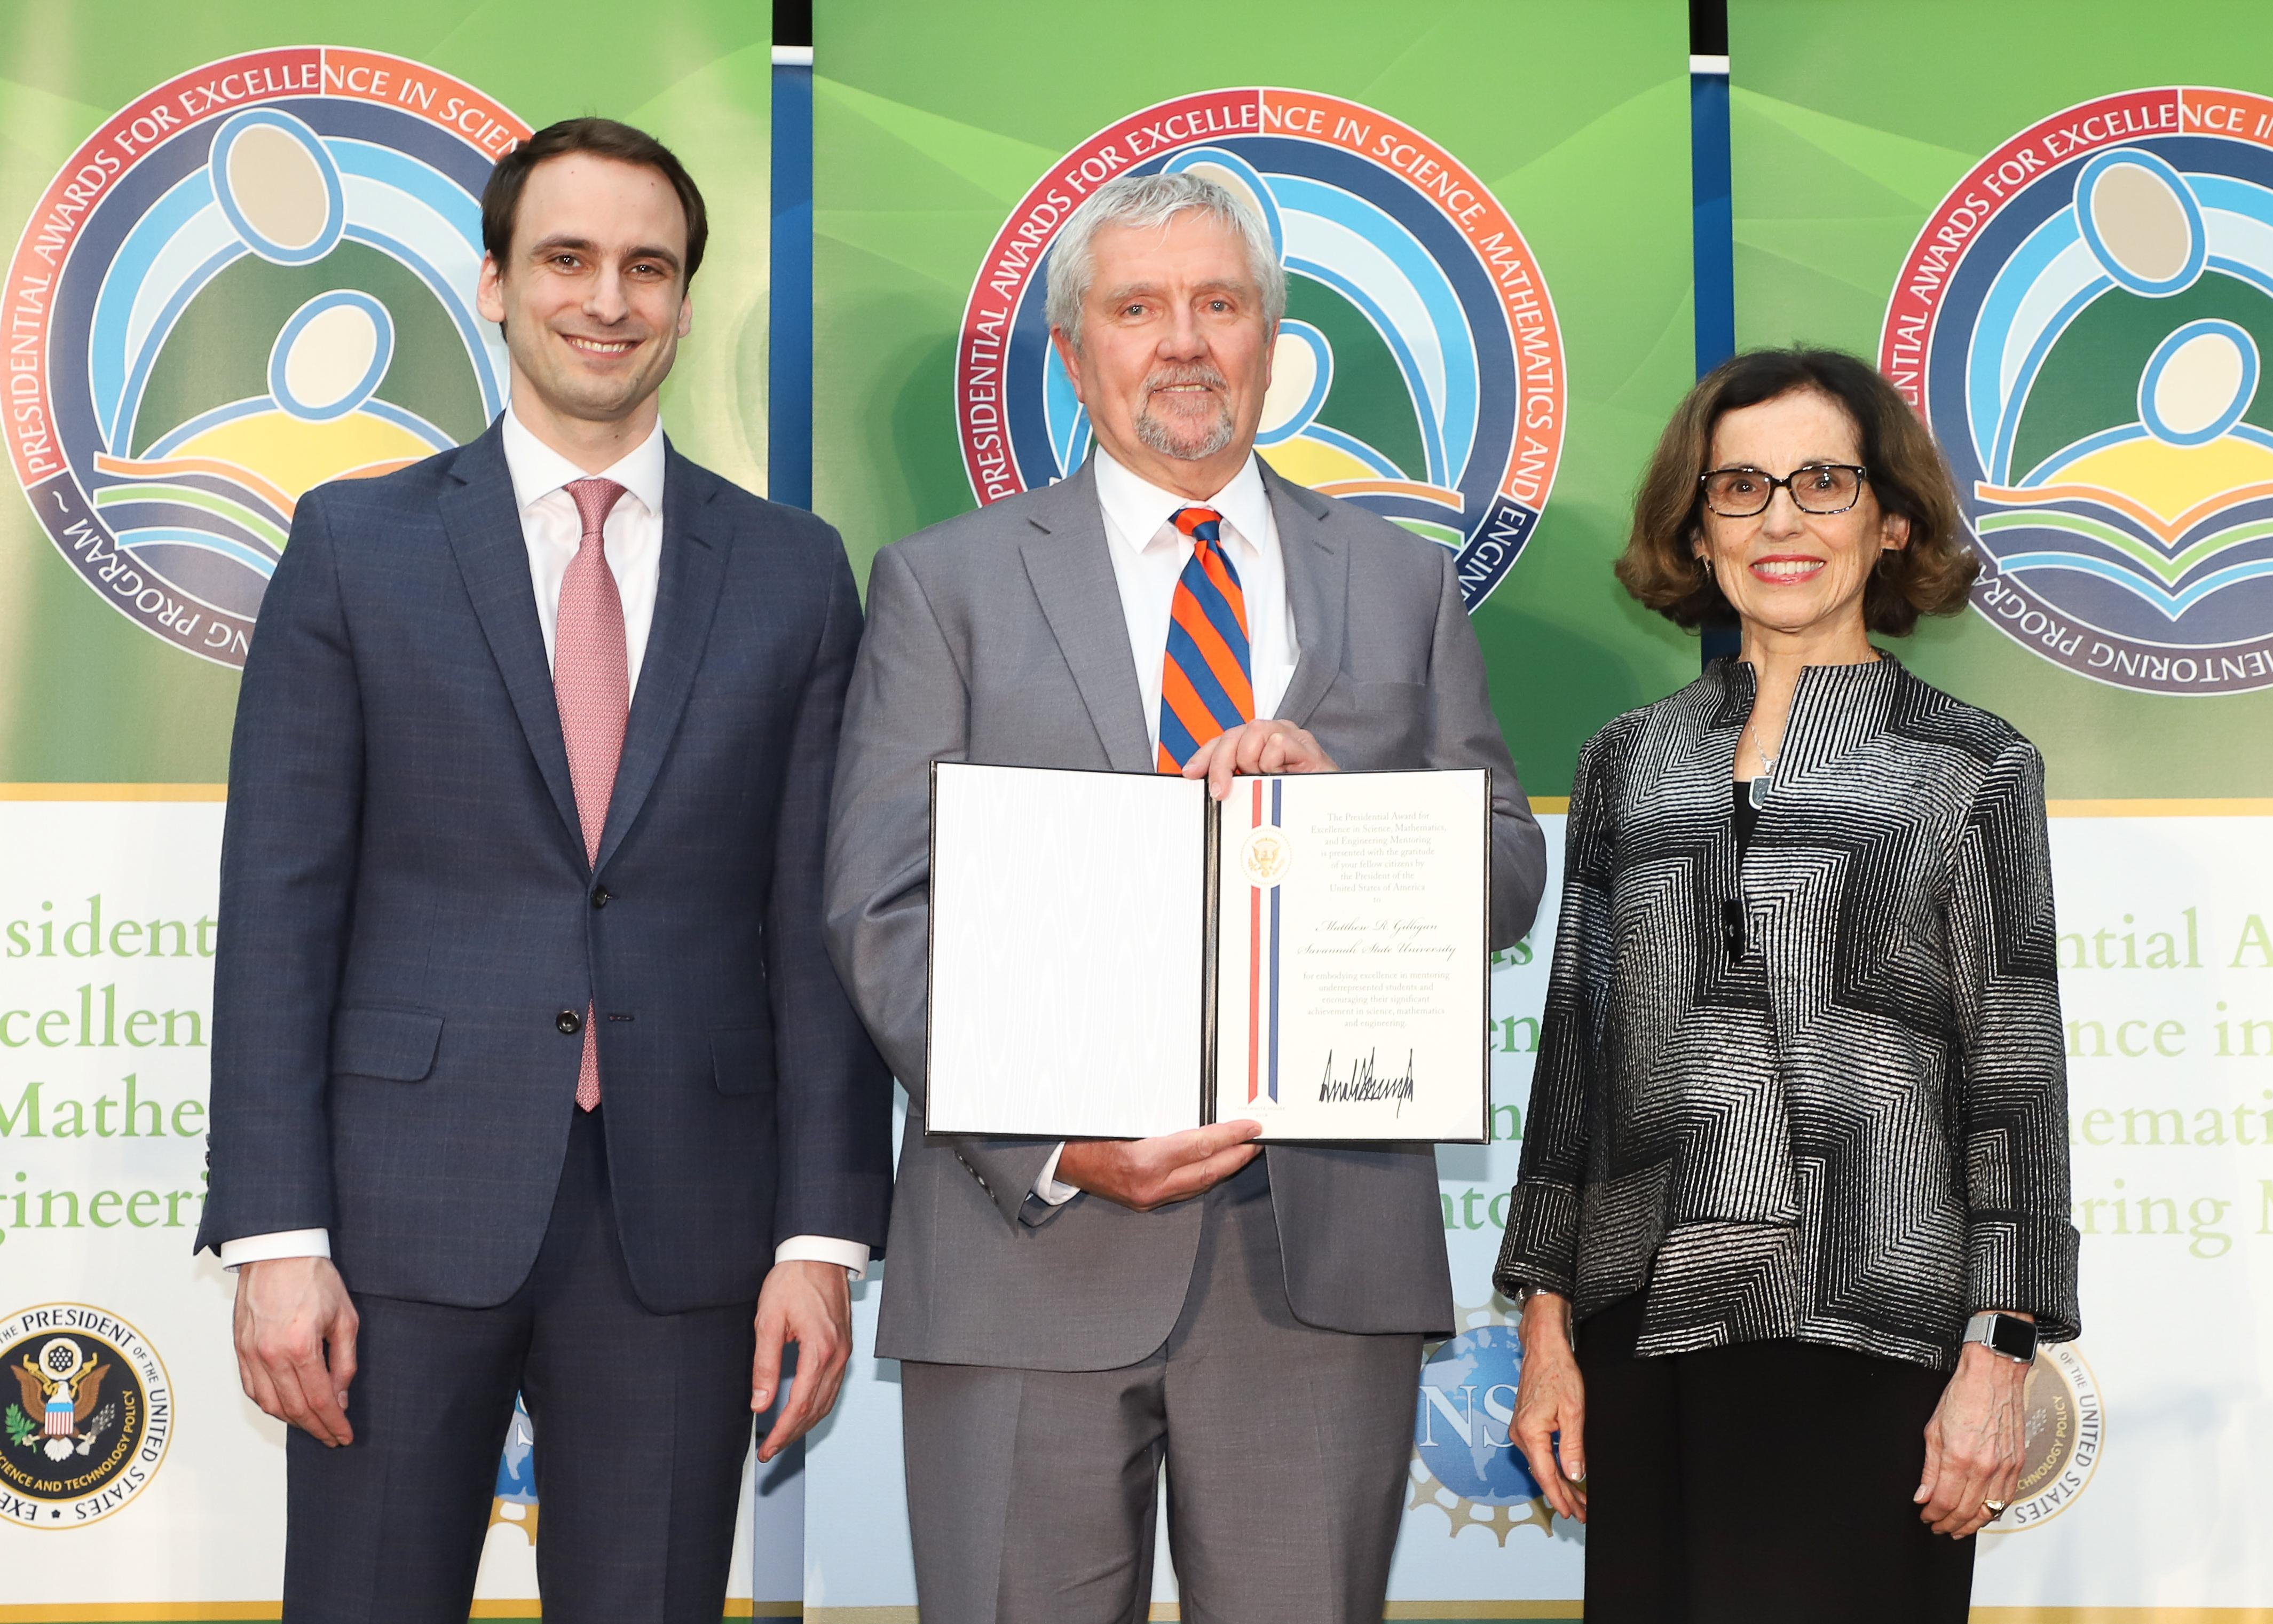 News : SSU professor emeritus accepts national award